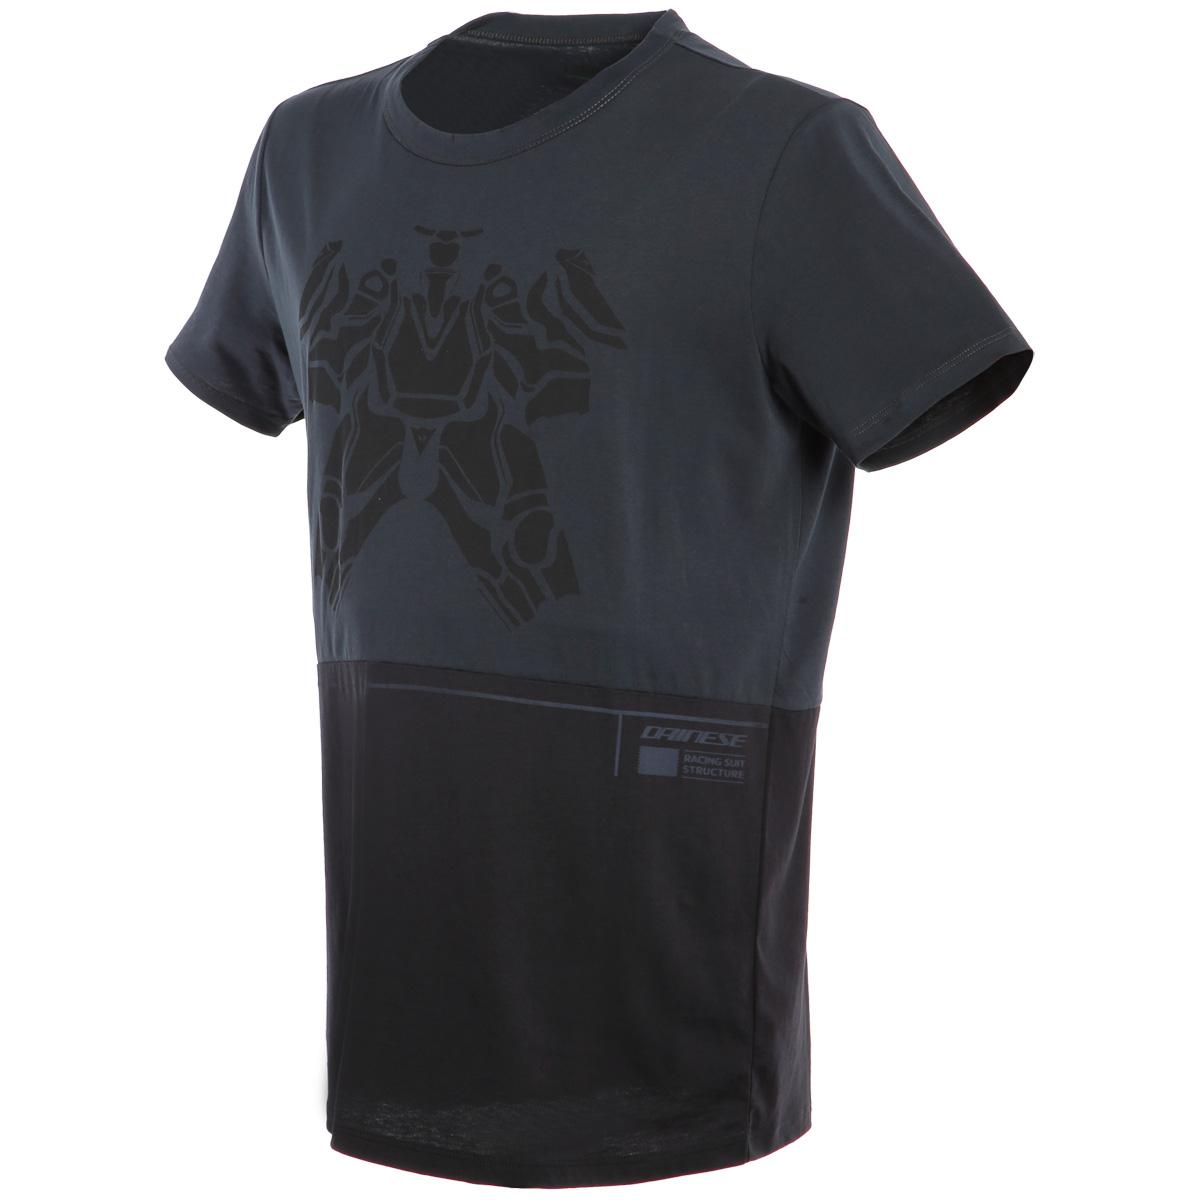 Camiseta DAINESE Laguna Seca Grey / Black